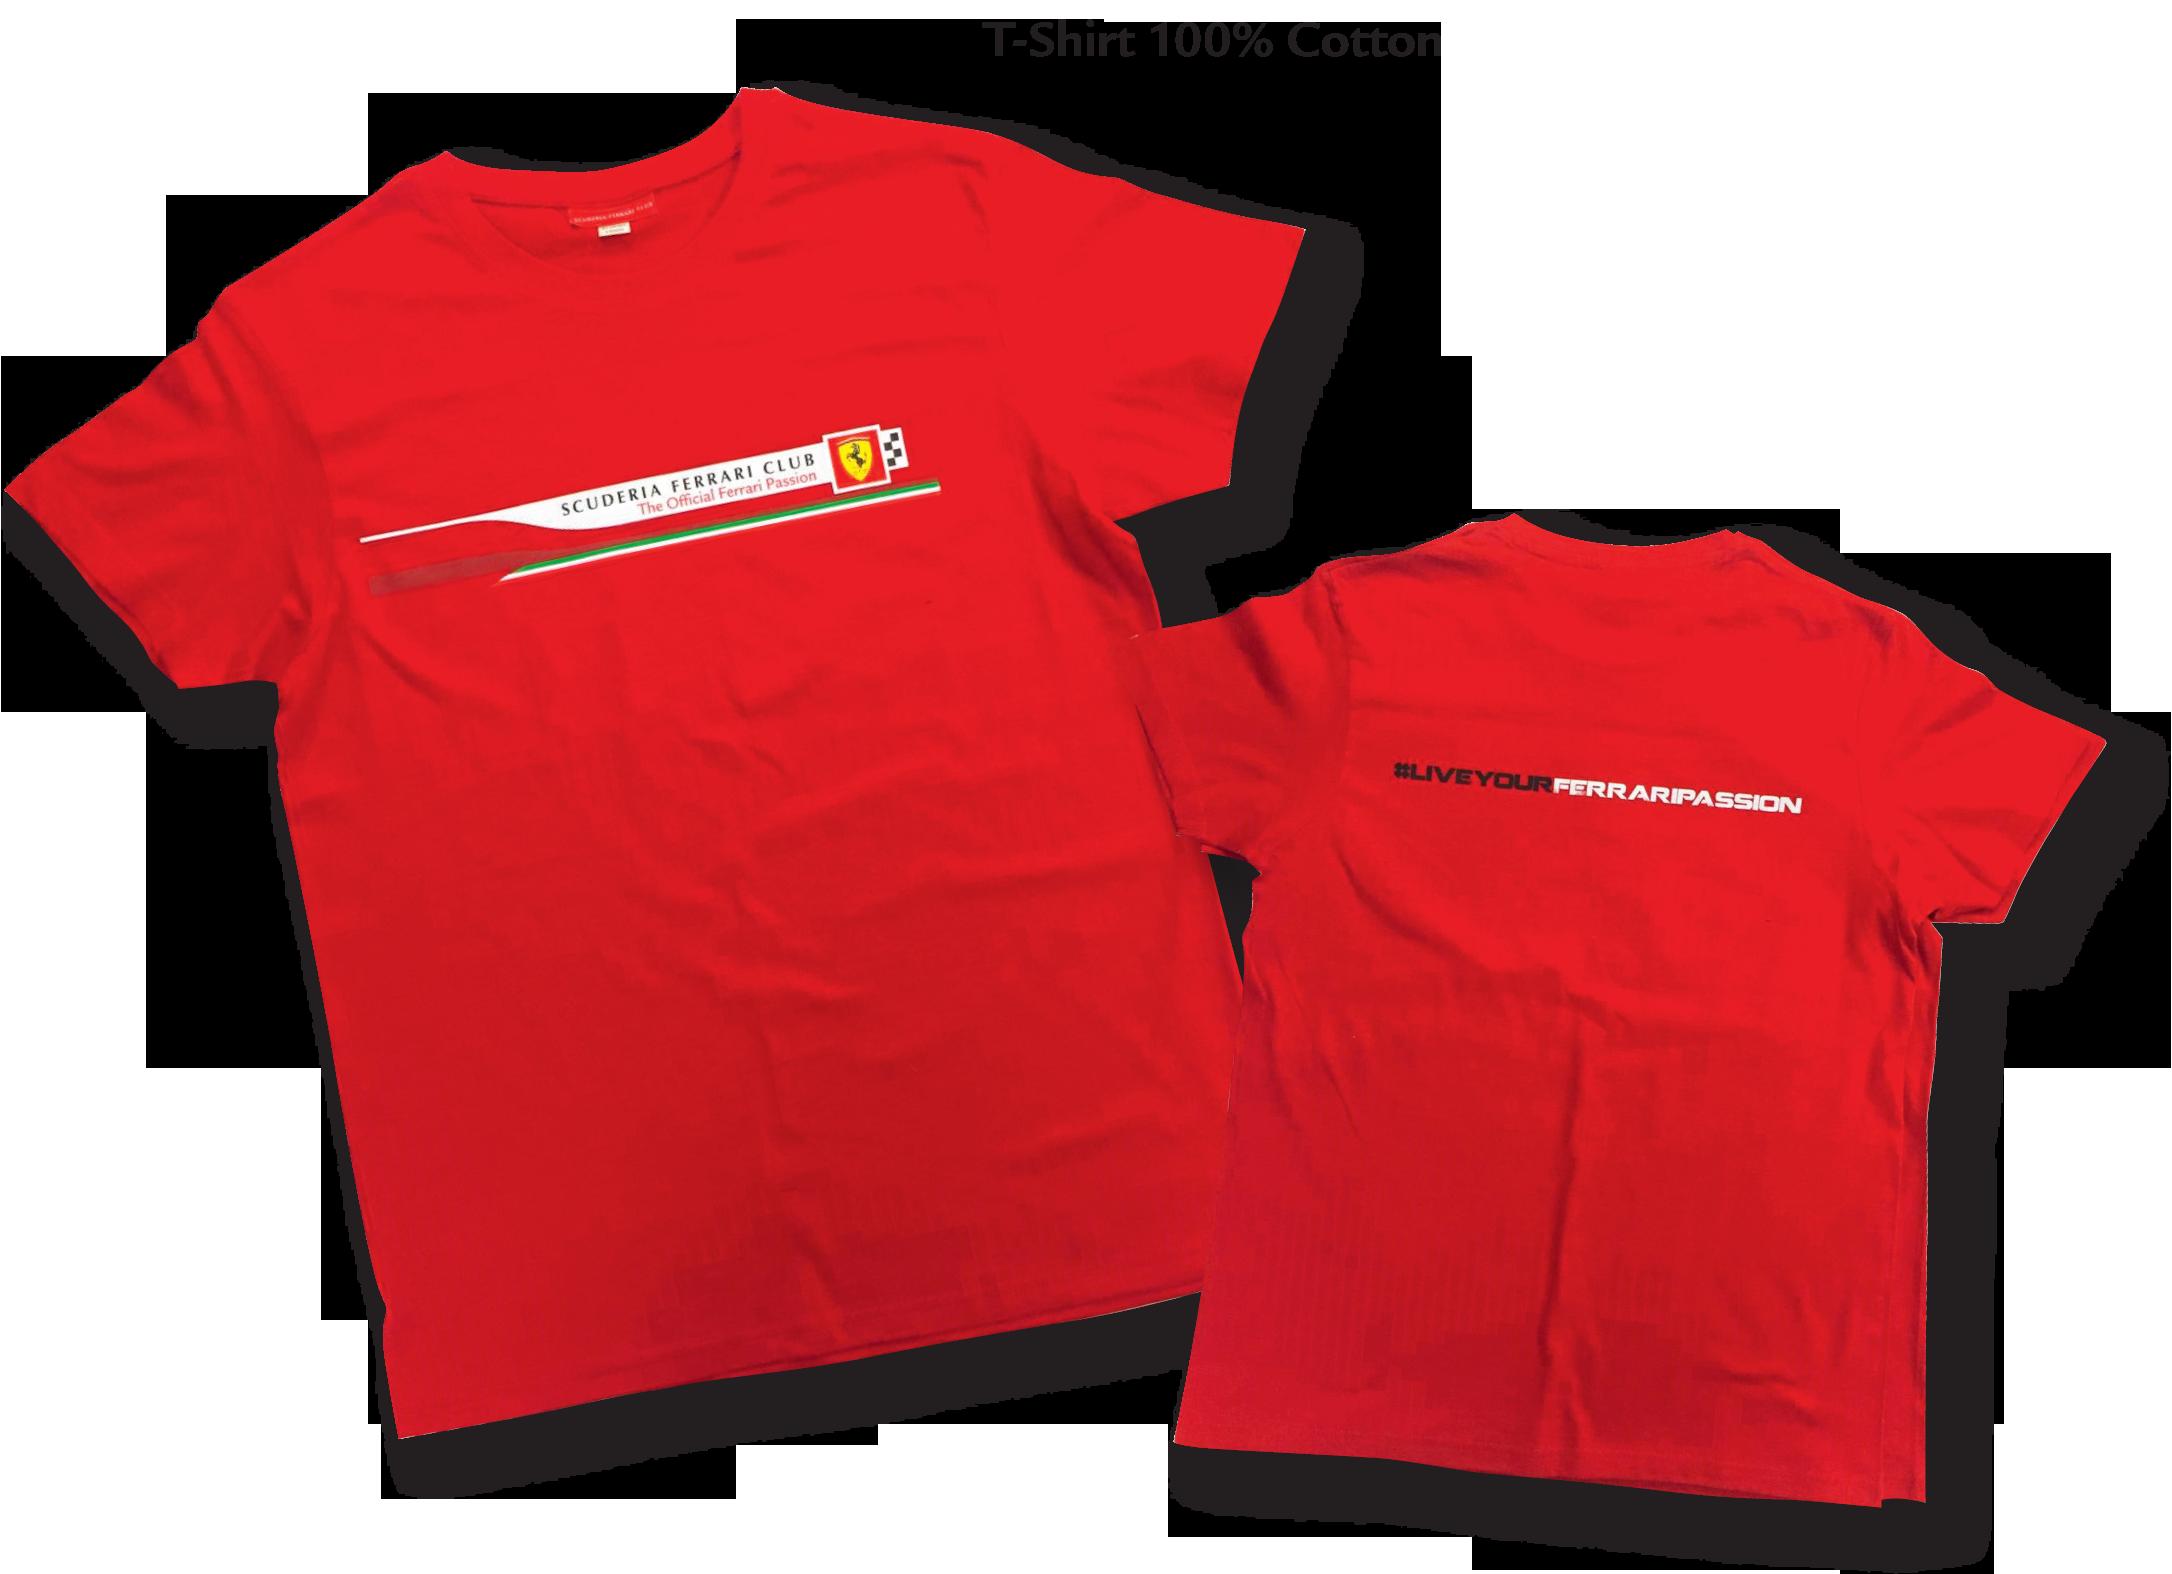 kit_2019_trasparente_t-shirt_en